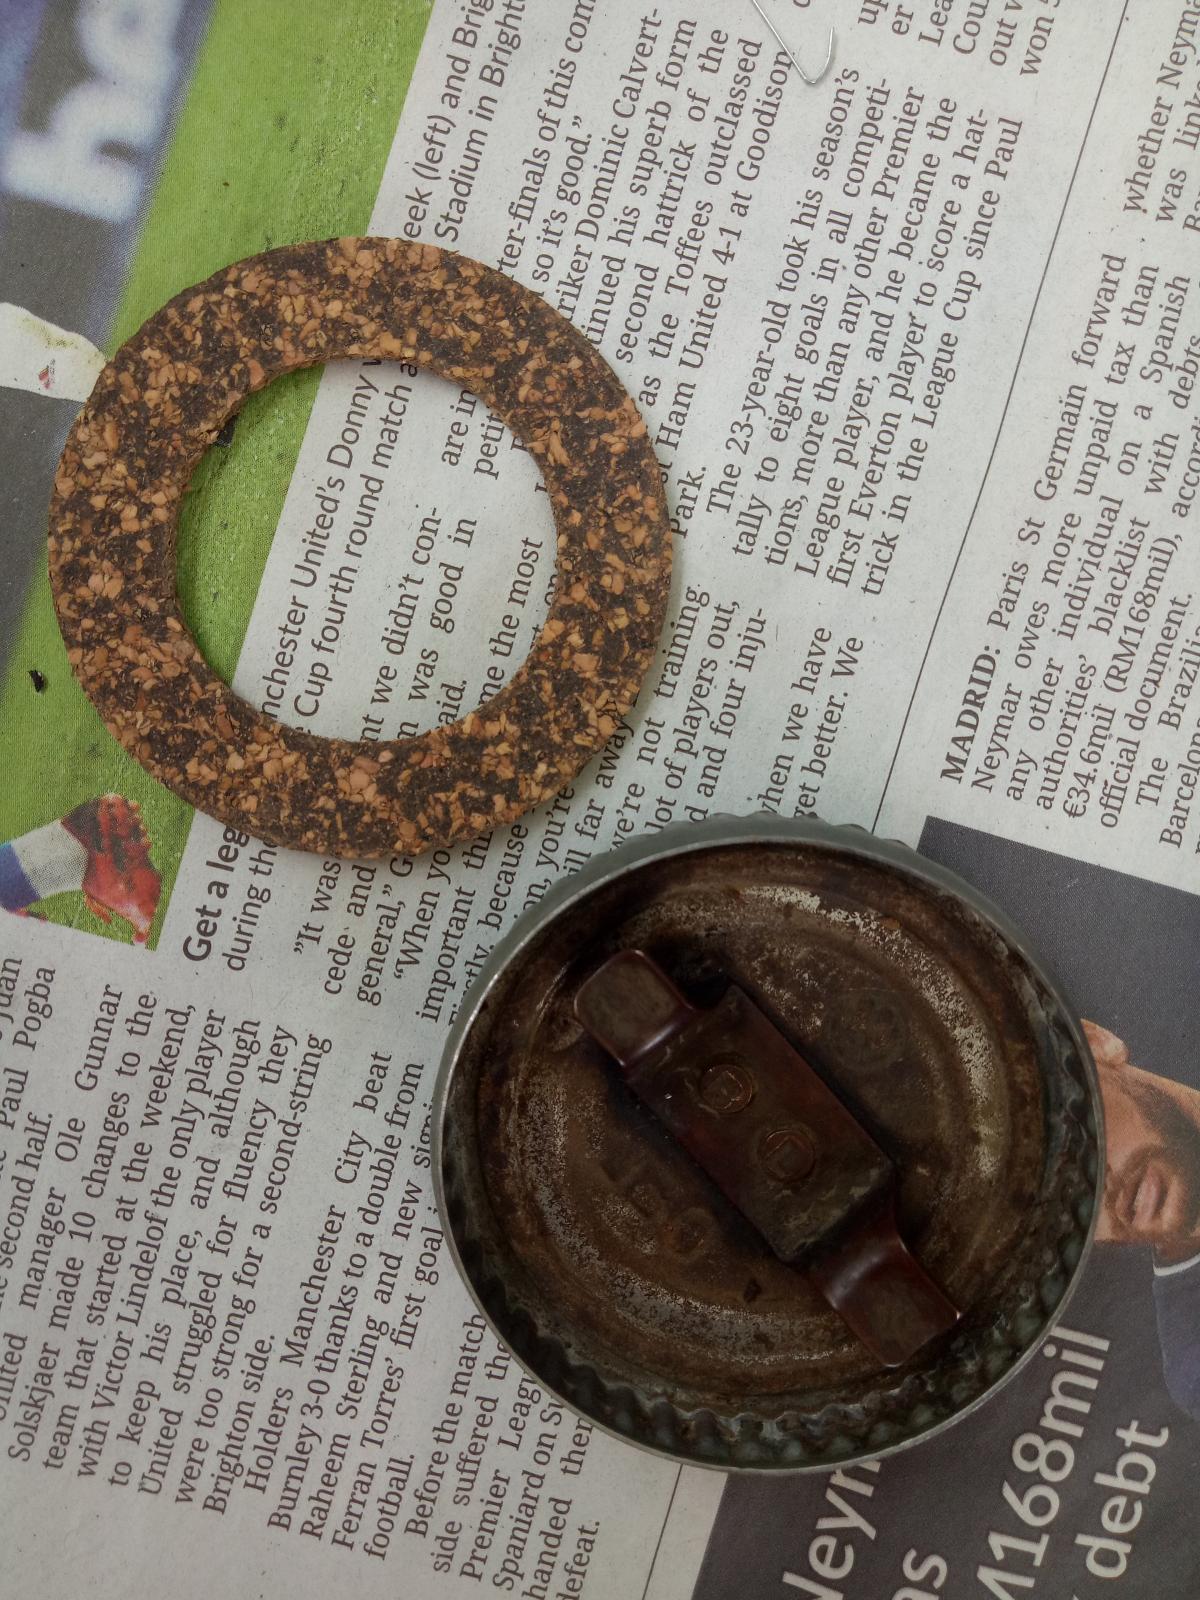 Oil filler cap and cork gasket